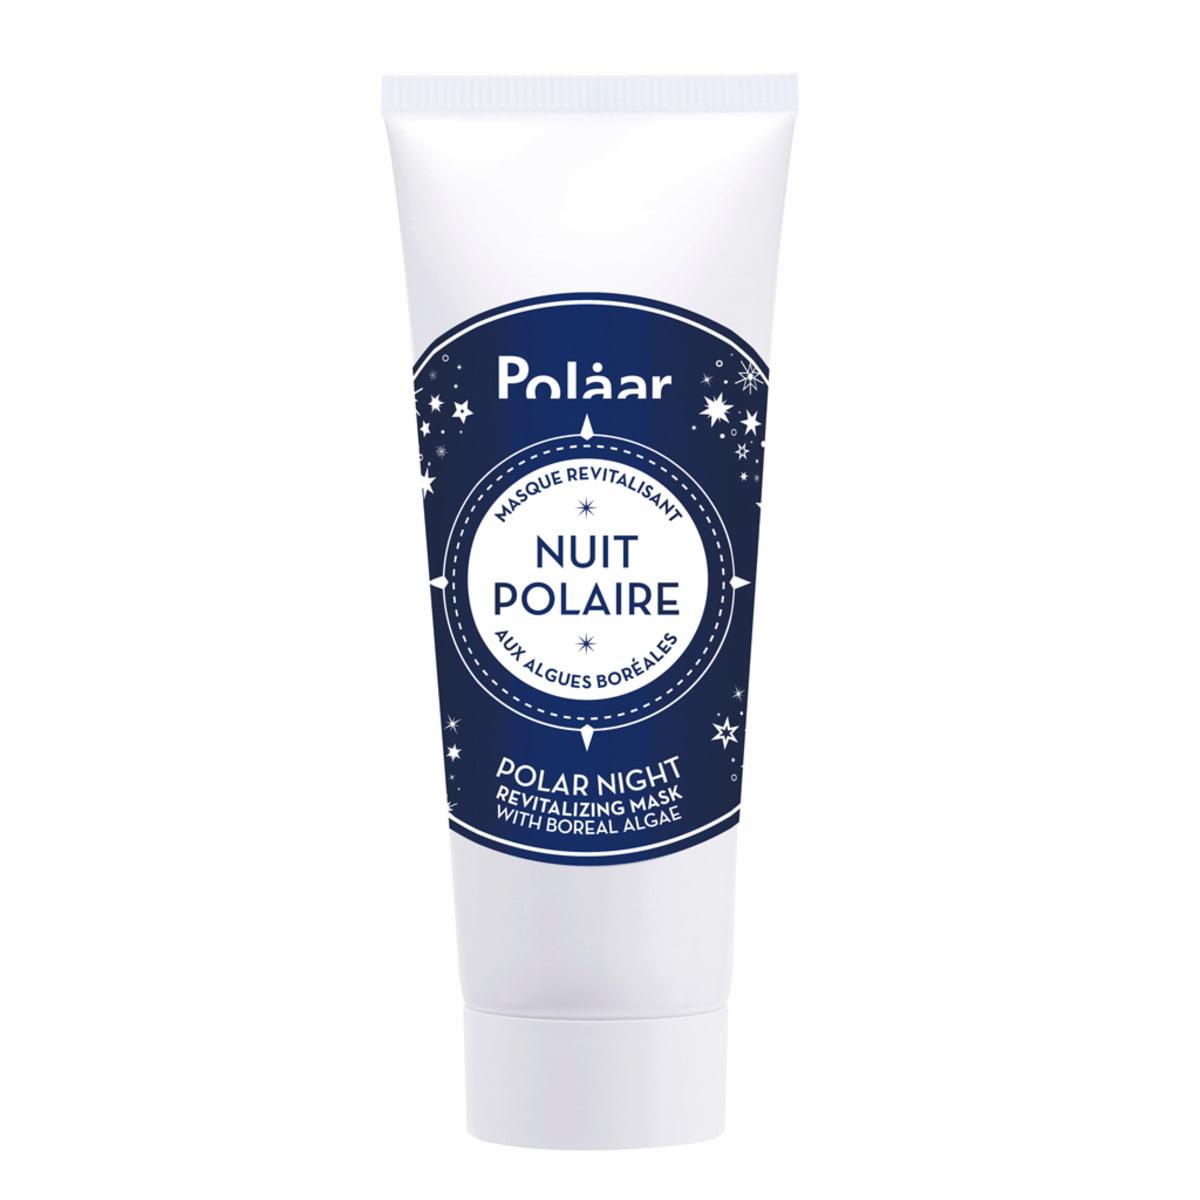 Polaar - Nuit Polaire - Masque revitalisant